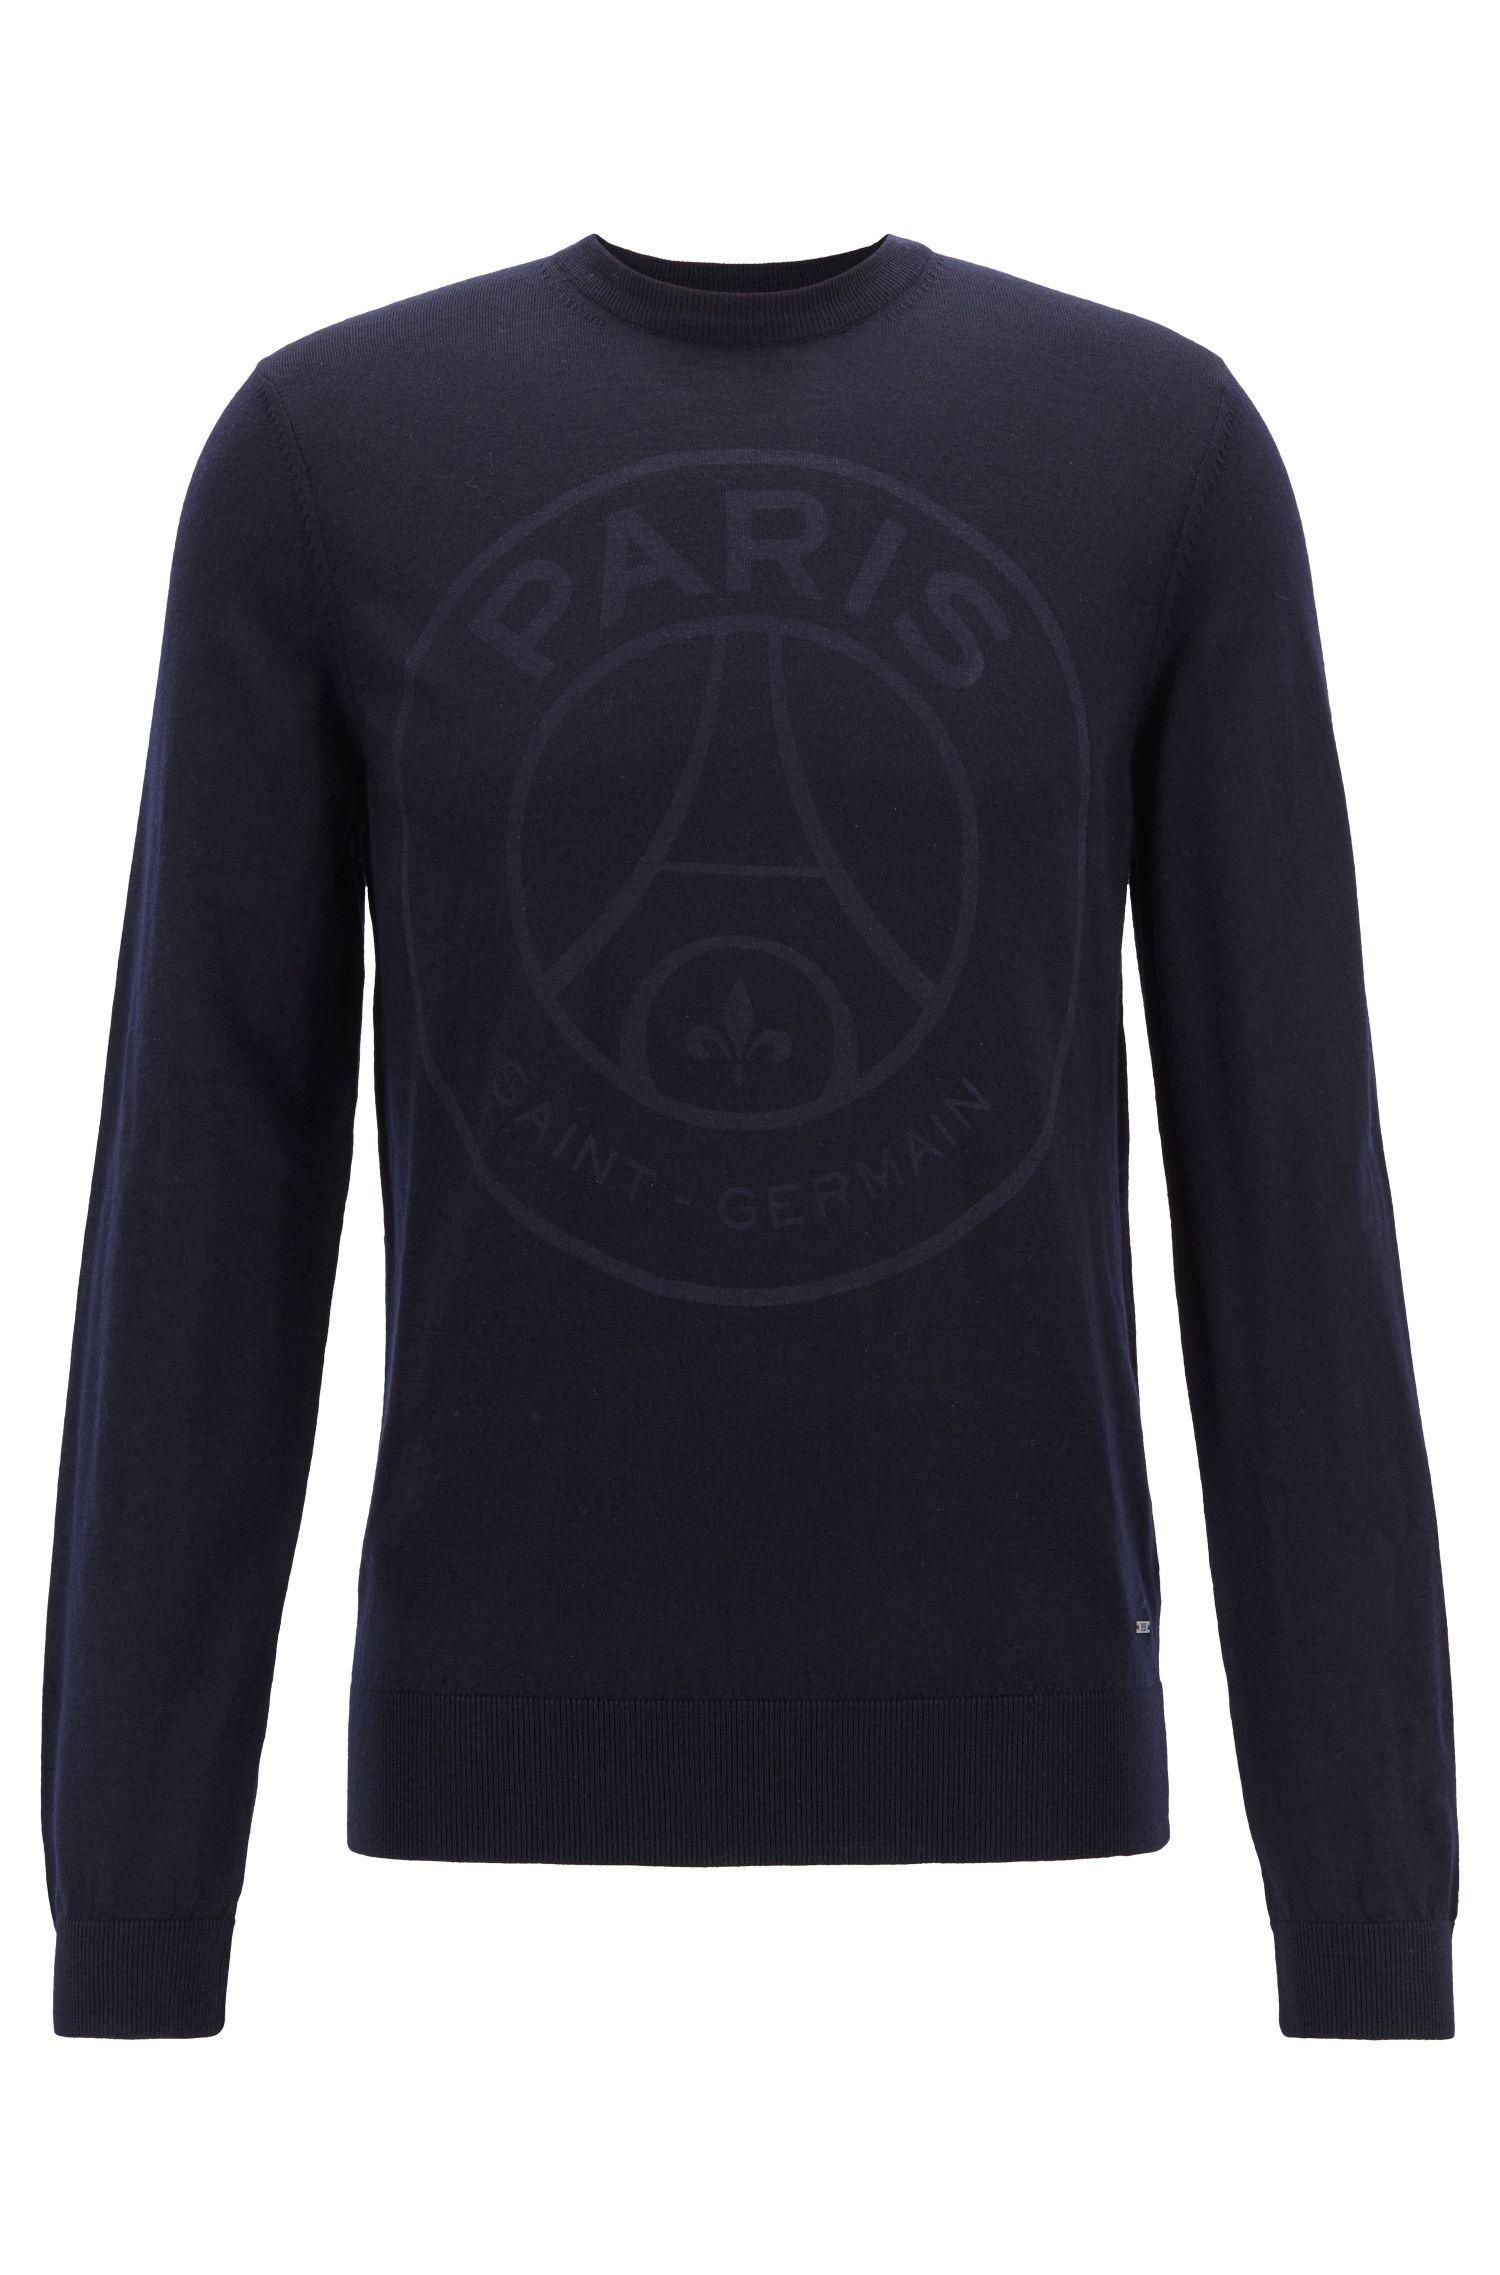 Limited-edition wool sweater with Paris Saint-Germain logo, Dark Blue